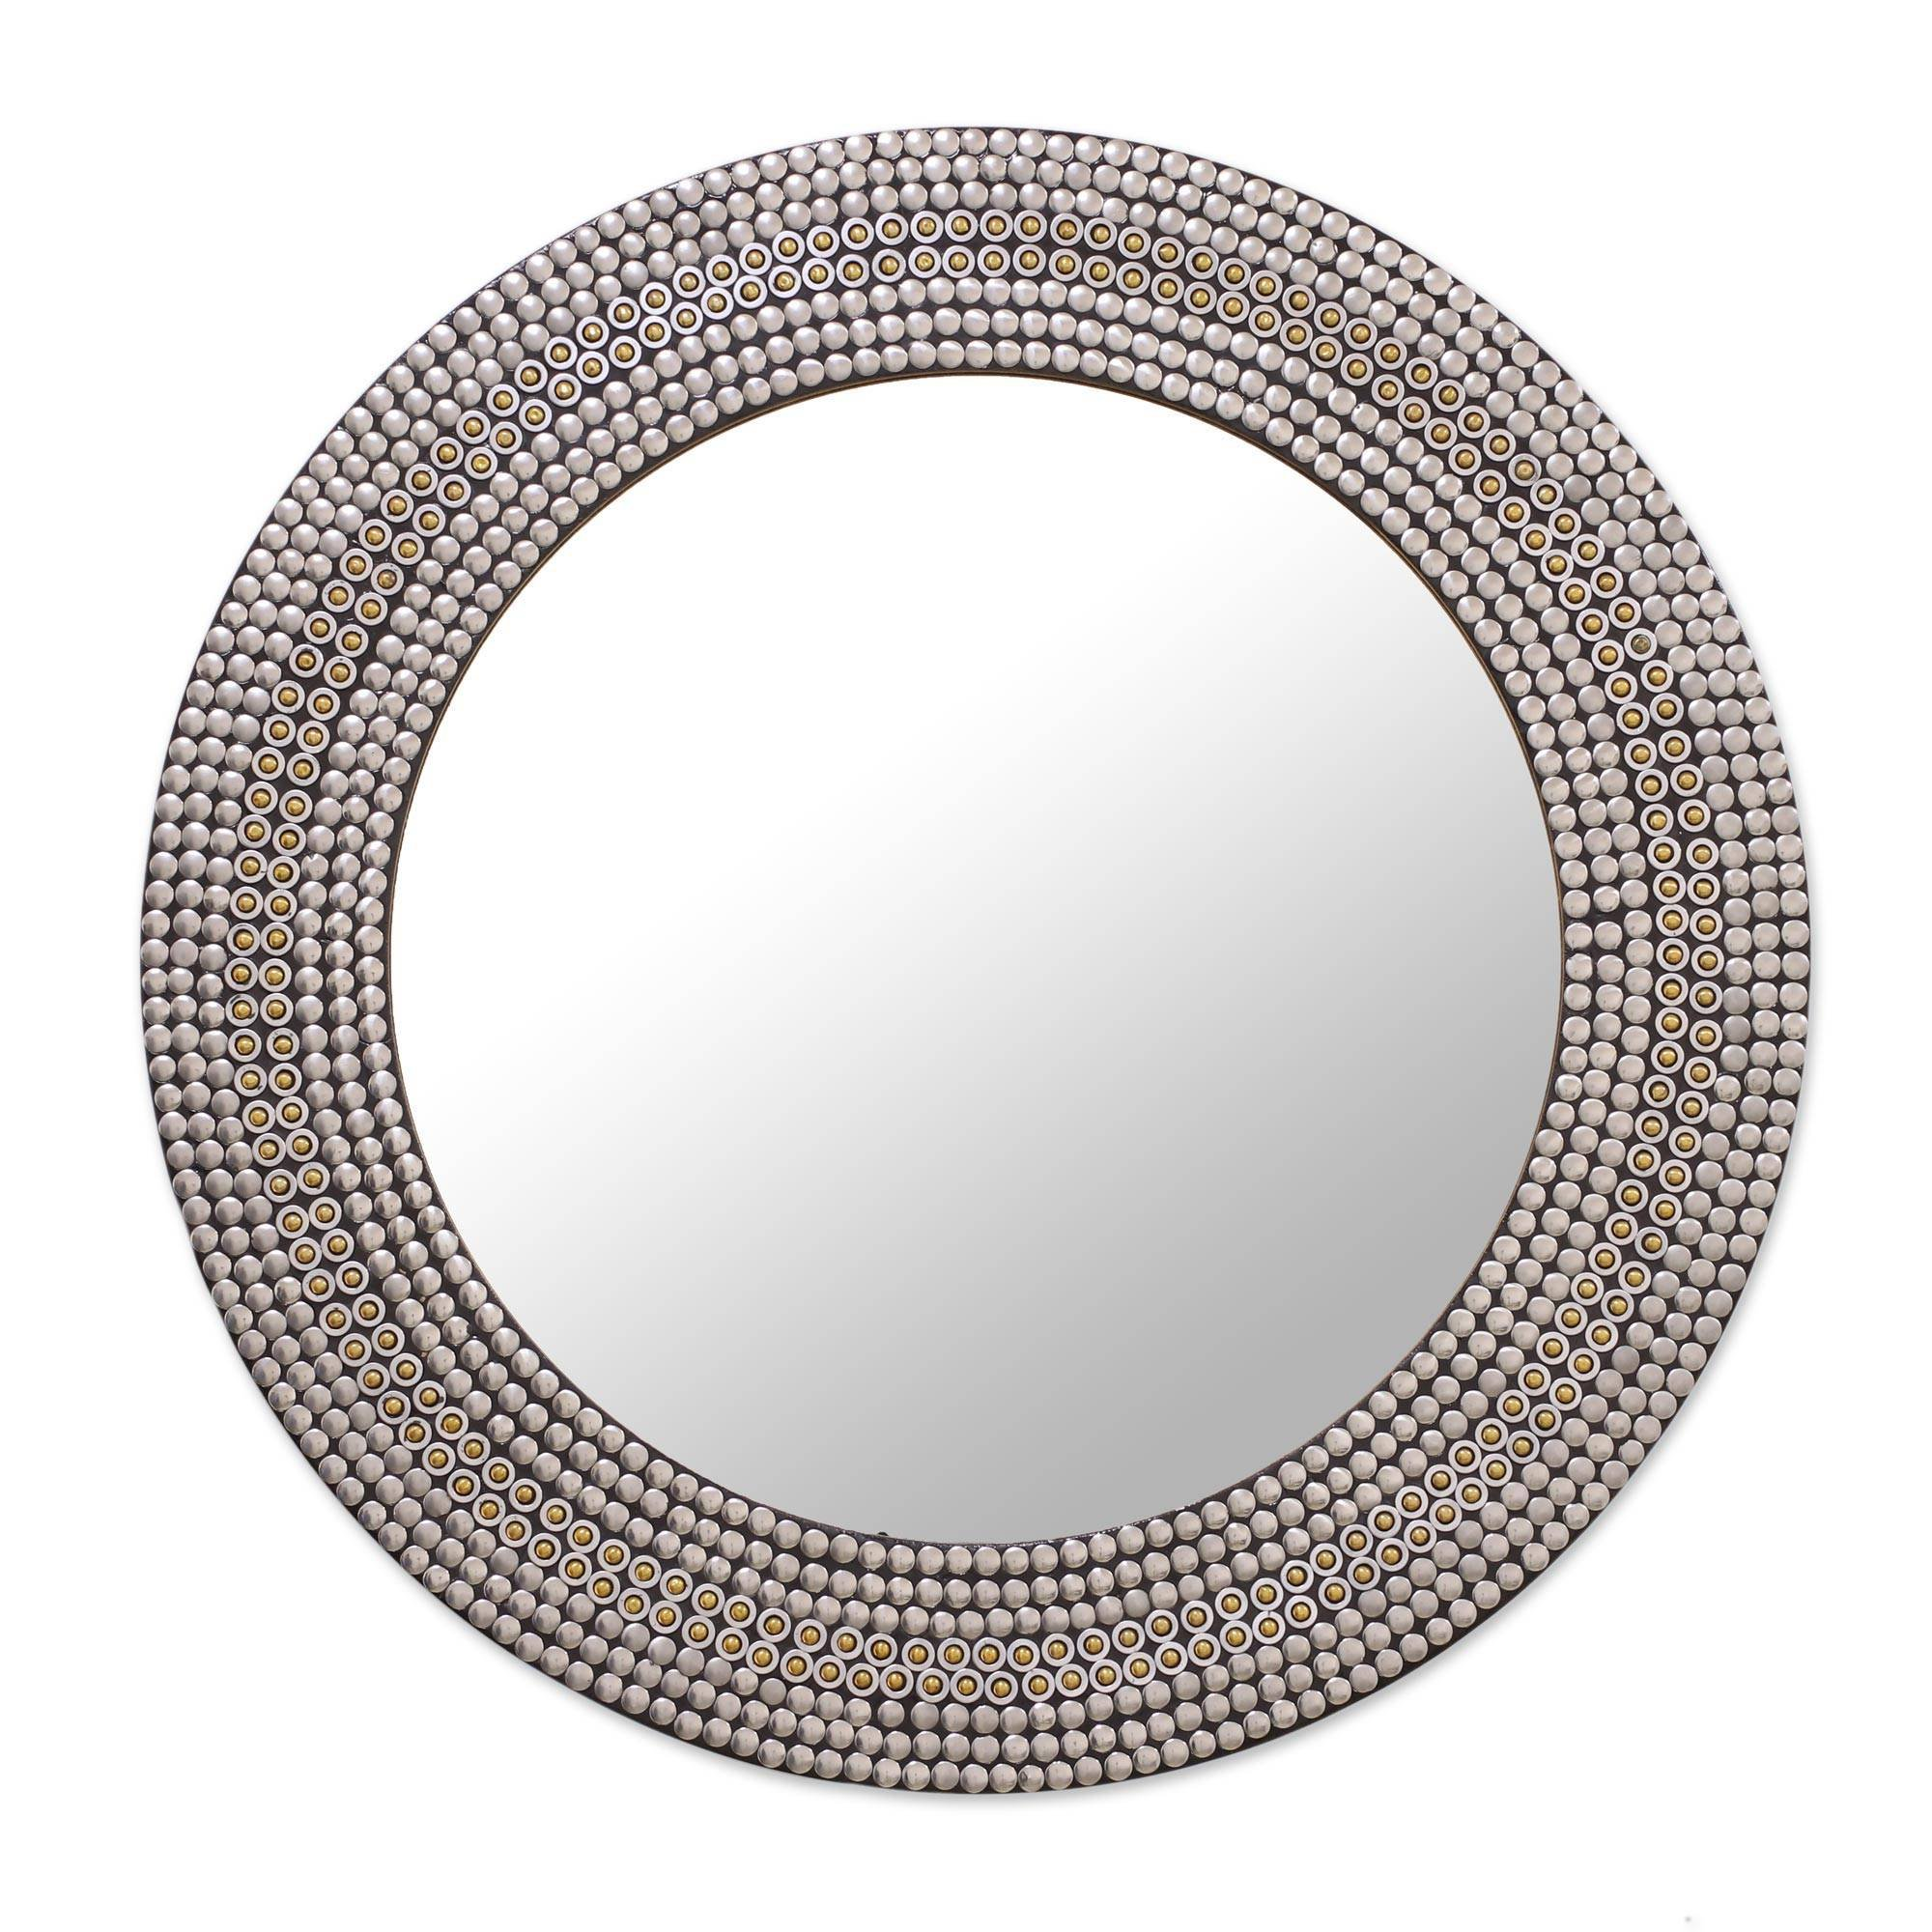 NOVICA Decorative Glass Wall Mounted Mirror, Metallic Brass, 'Shimmery Allure'